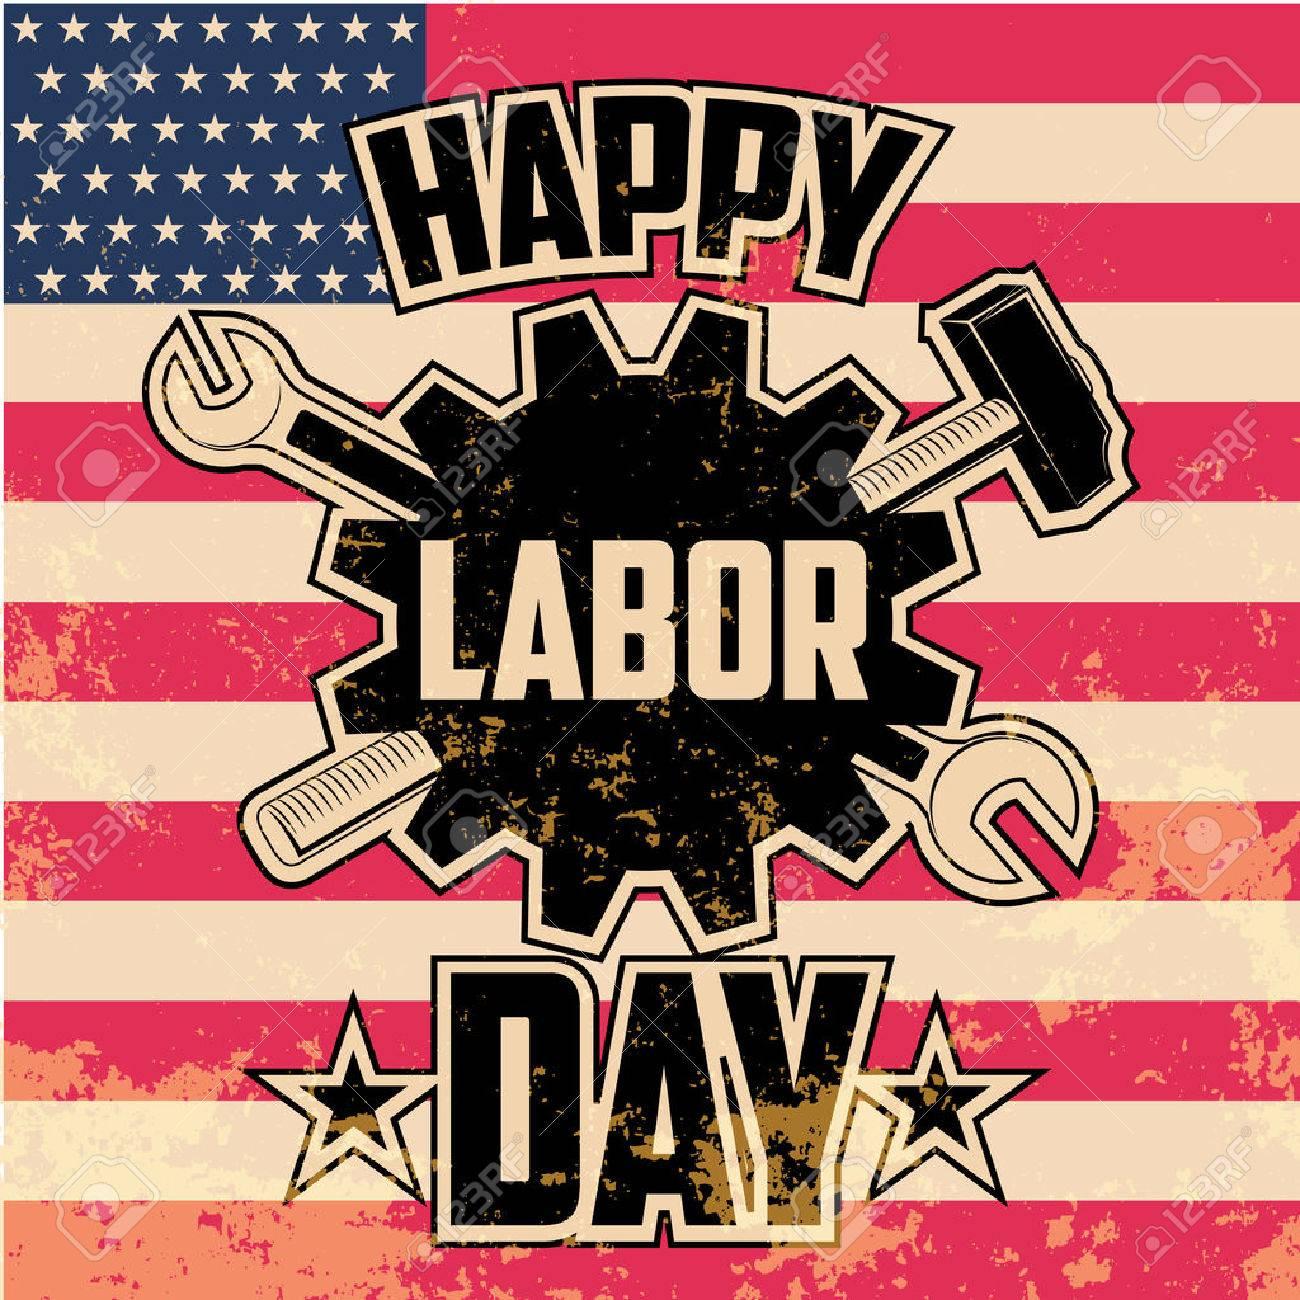 Happy Labor Day , Vintage Style Grunge Vector Illustration